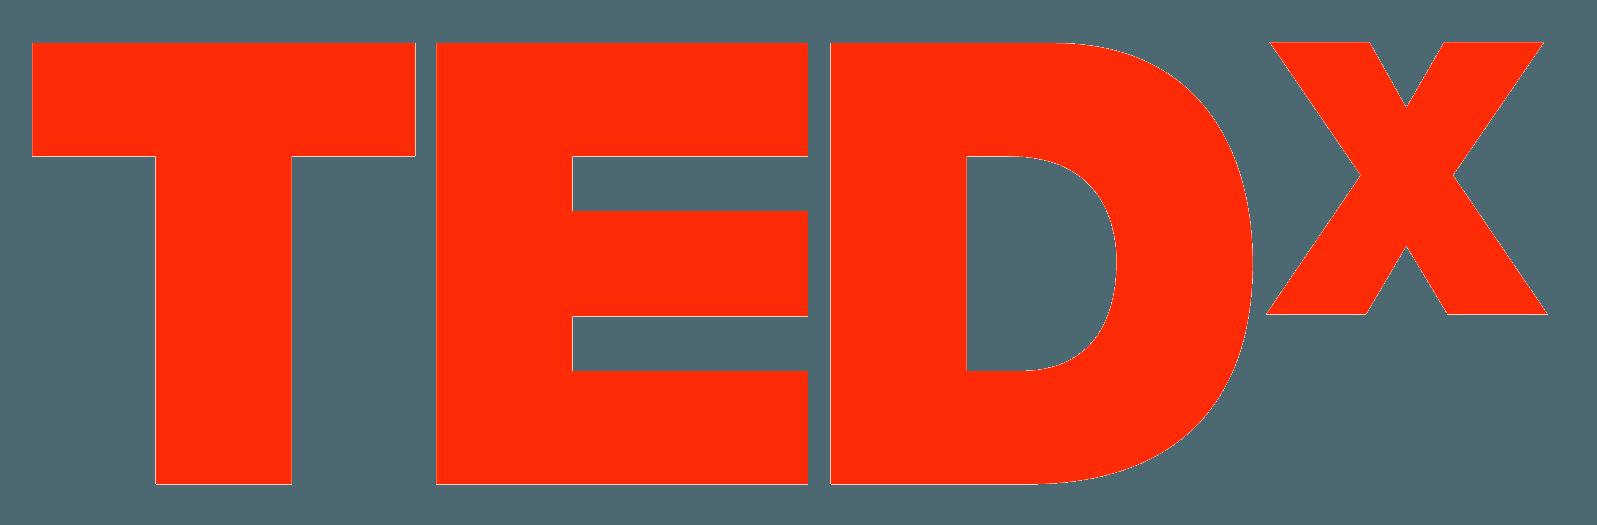 Speechi à TEDx